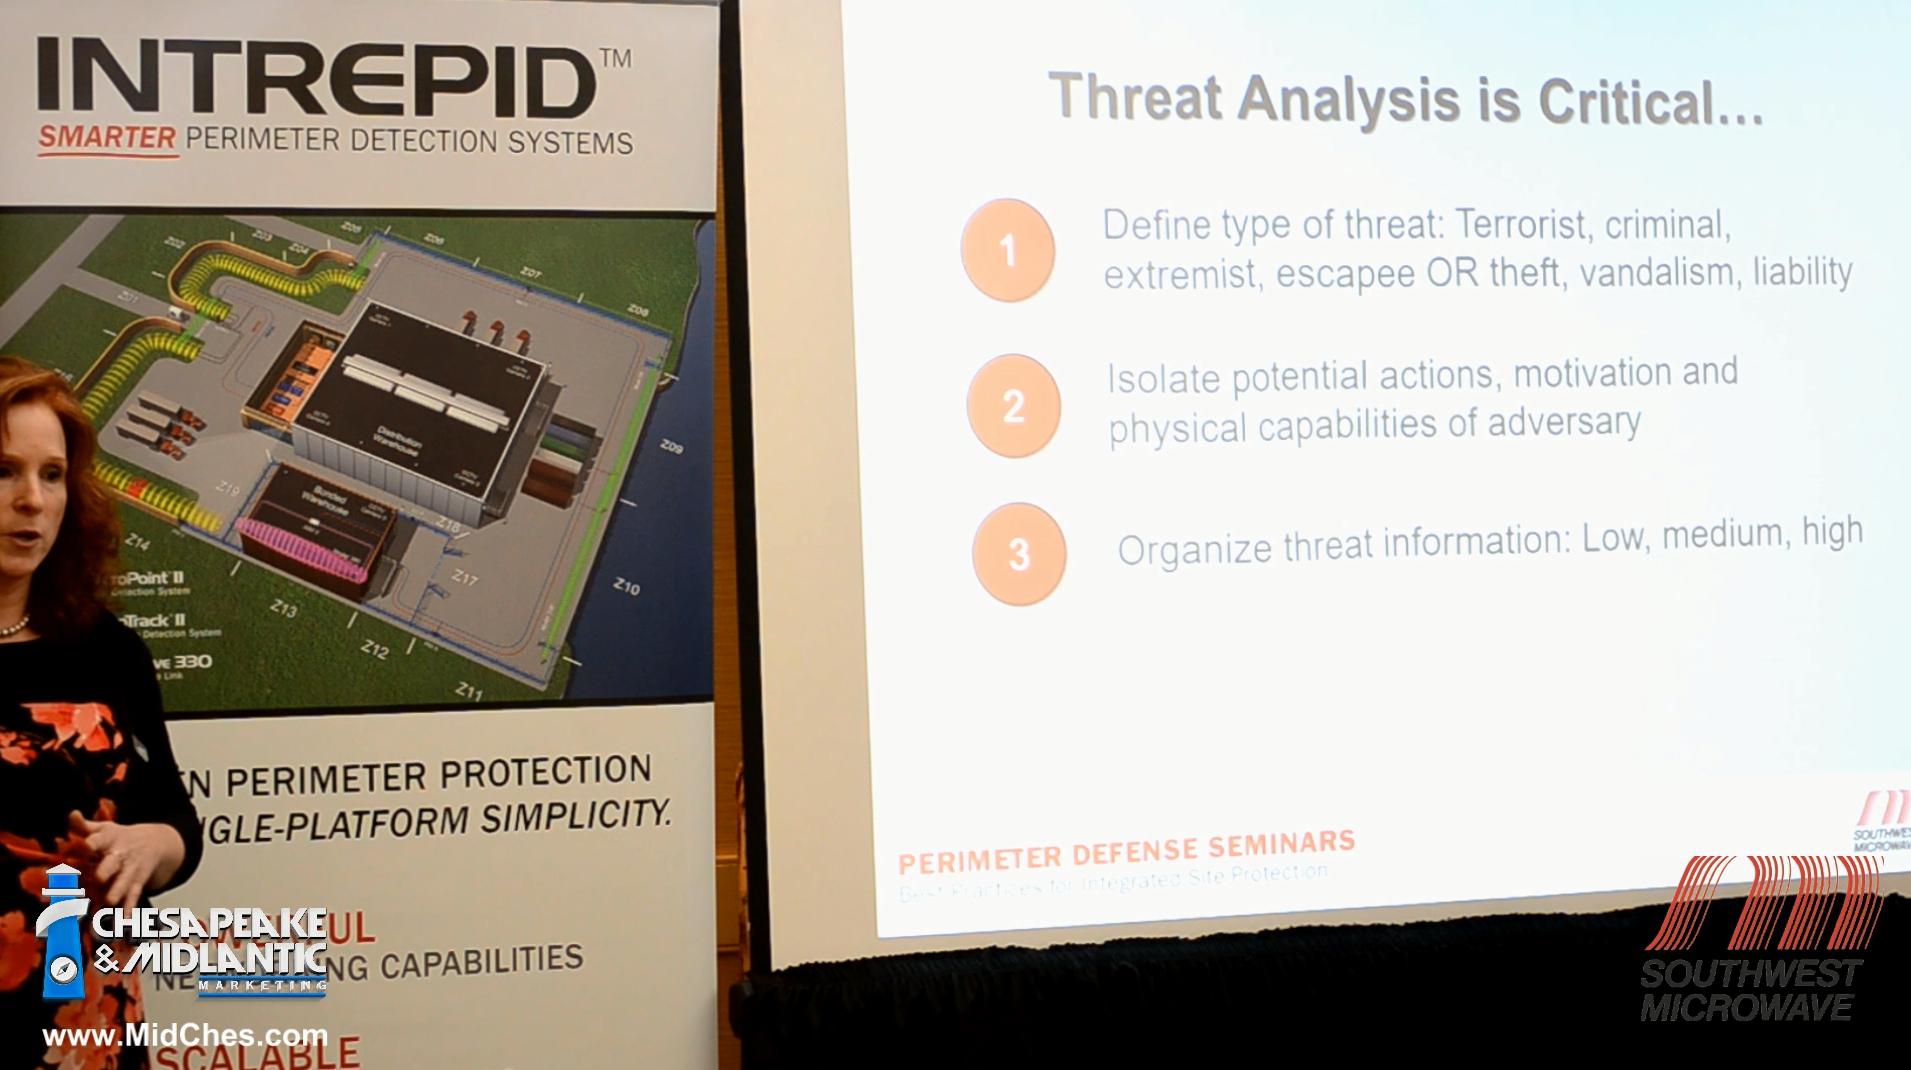 Perimeter Defense Seminar Series Overview thumbnail 2.png